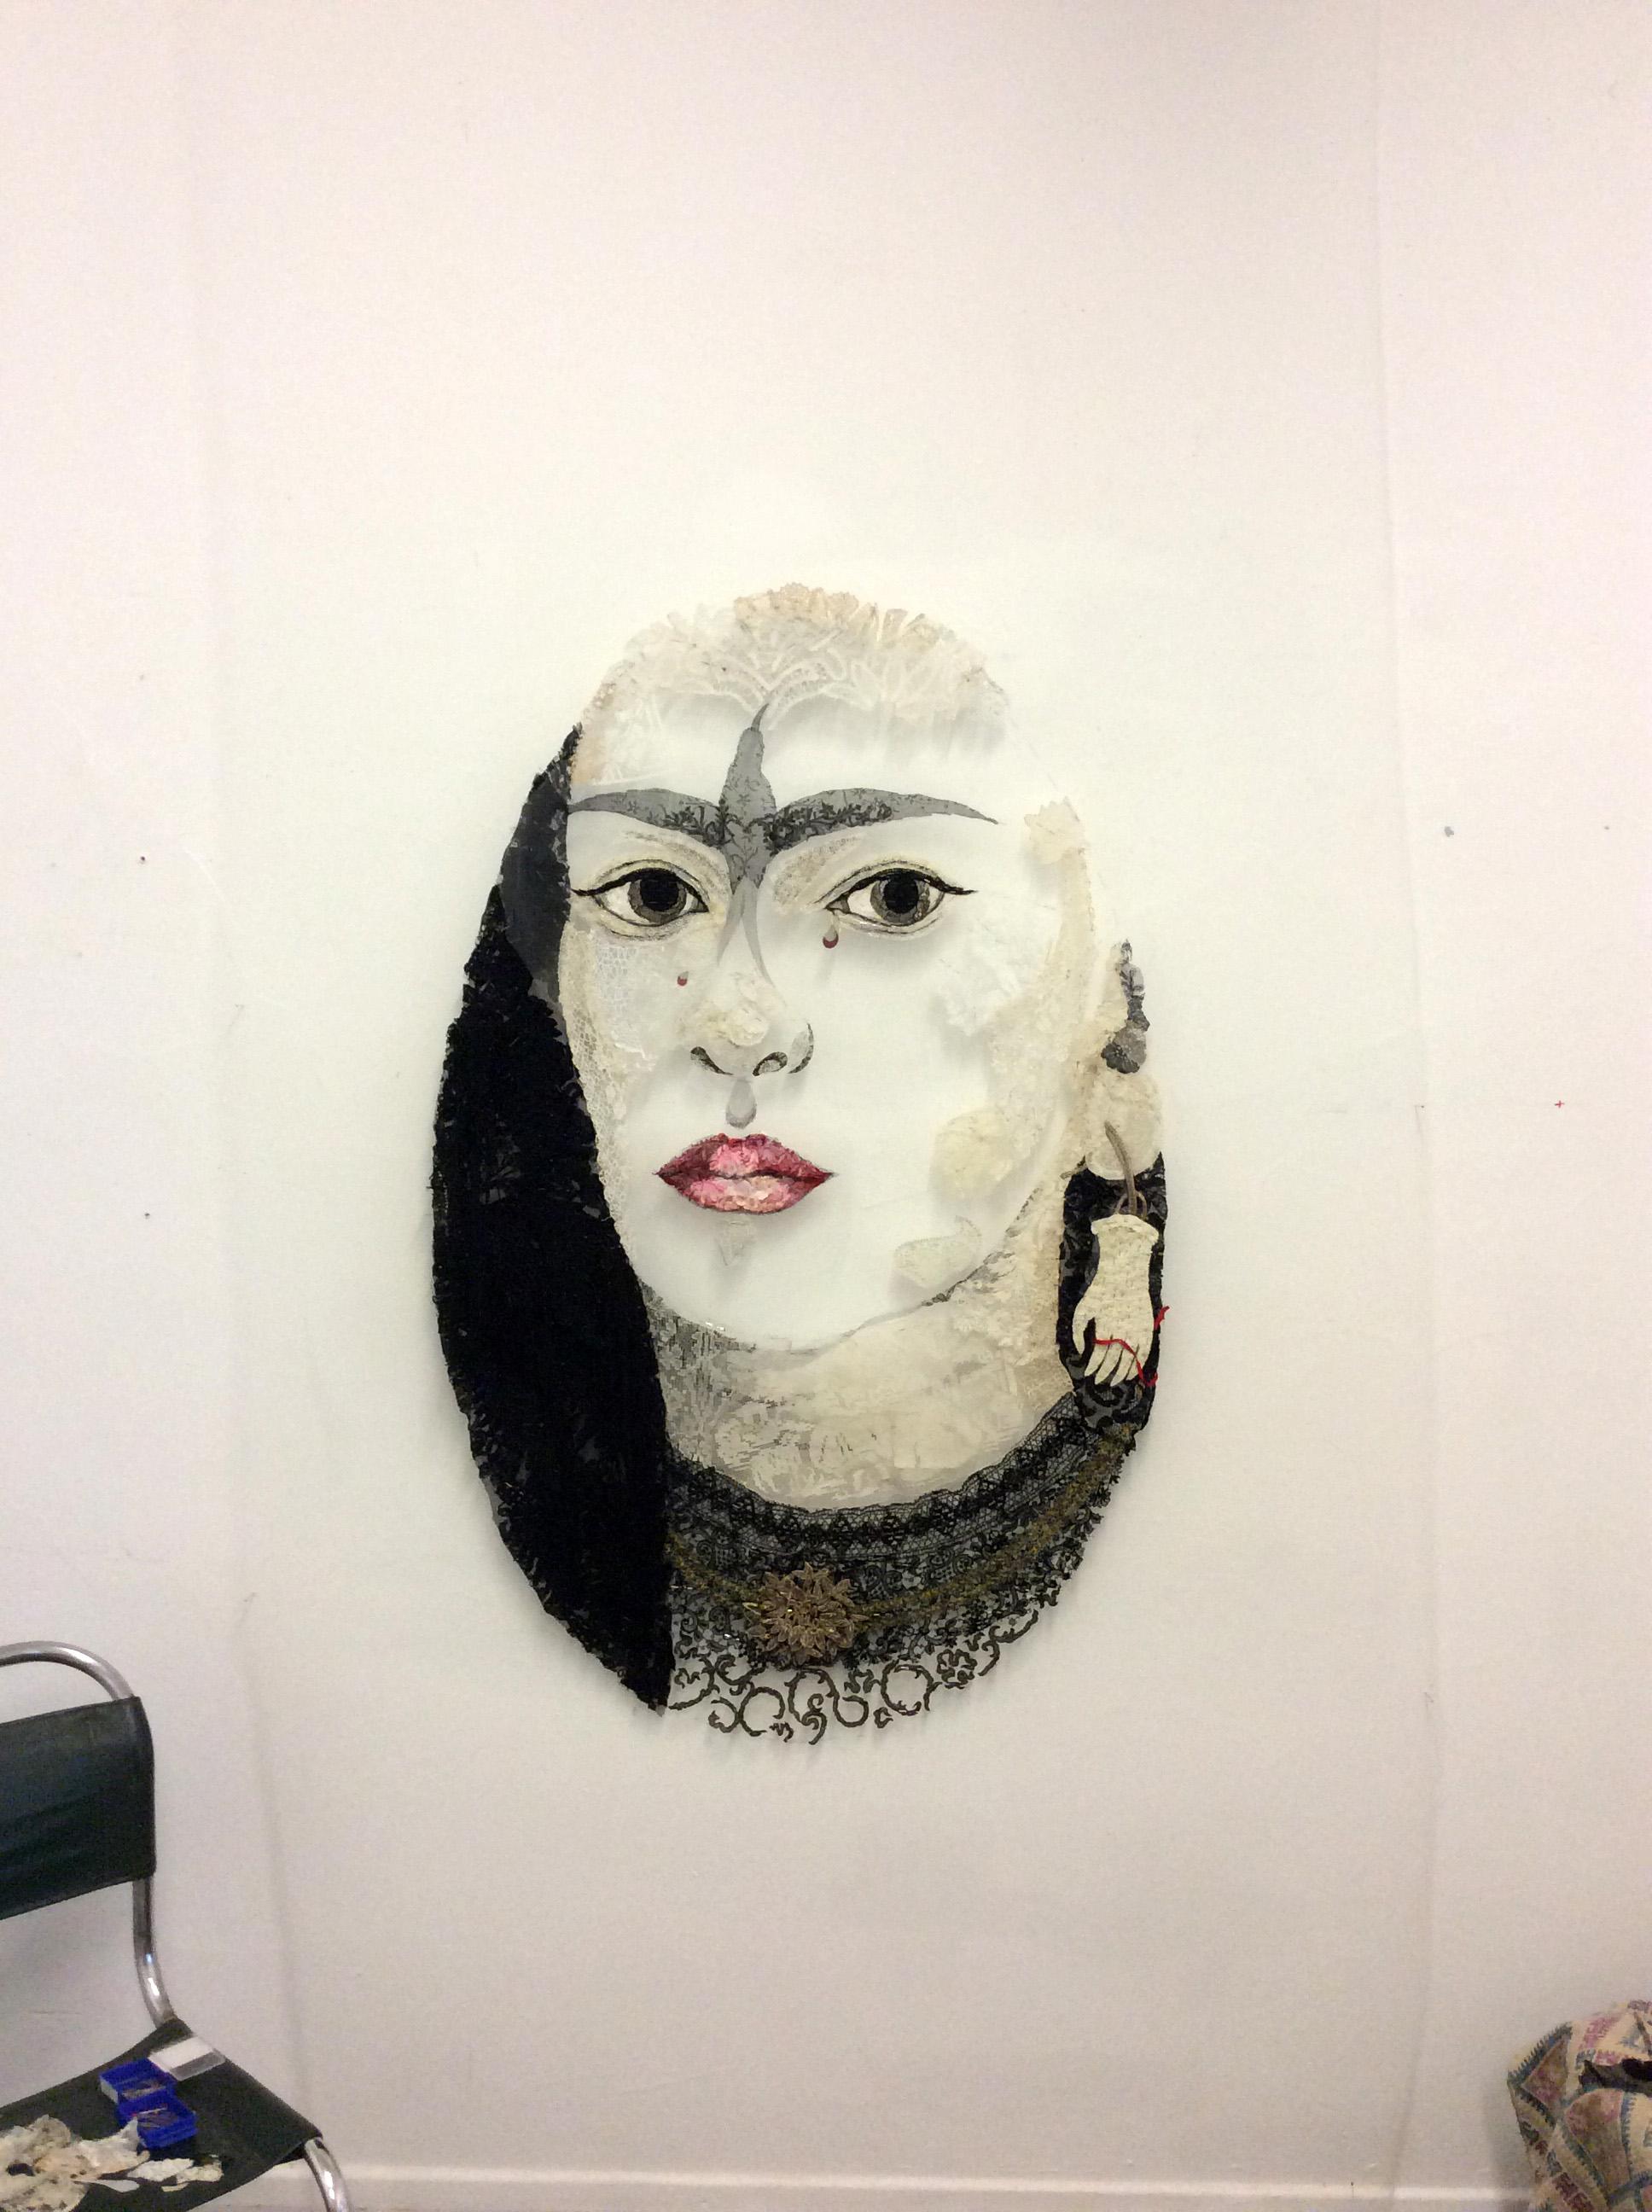 """Lover's Eye #1 - after Kahlo 1945"" in progress"